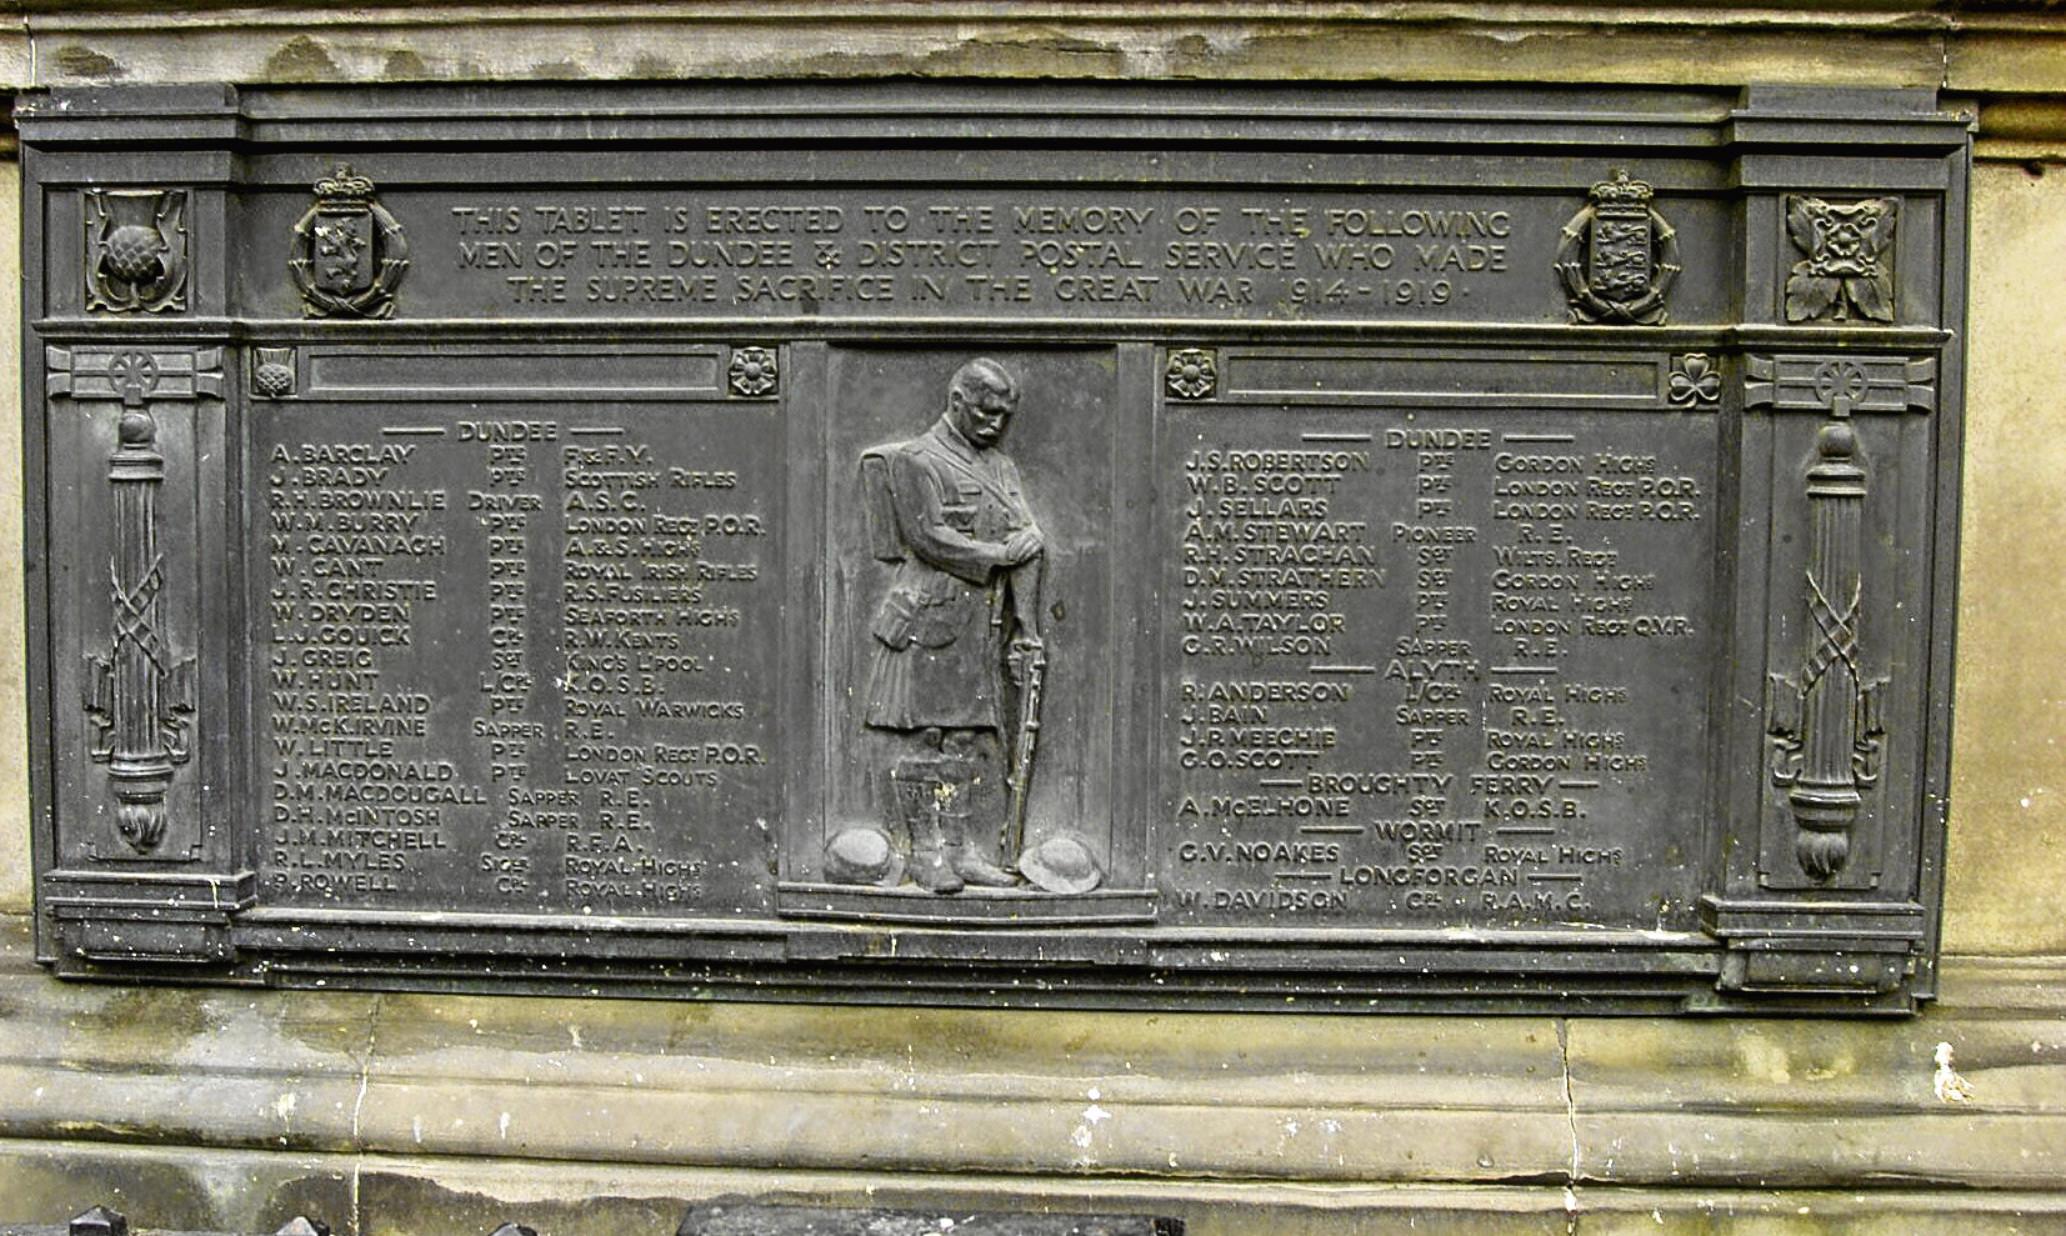 The Post Office war memorial.